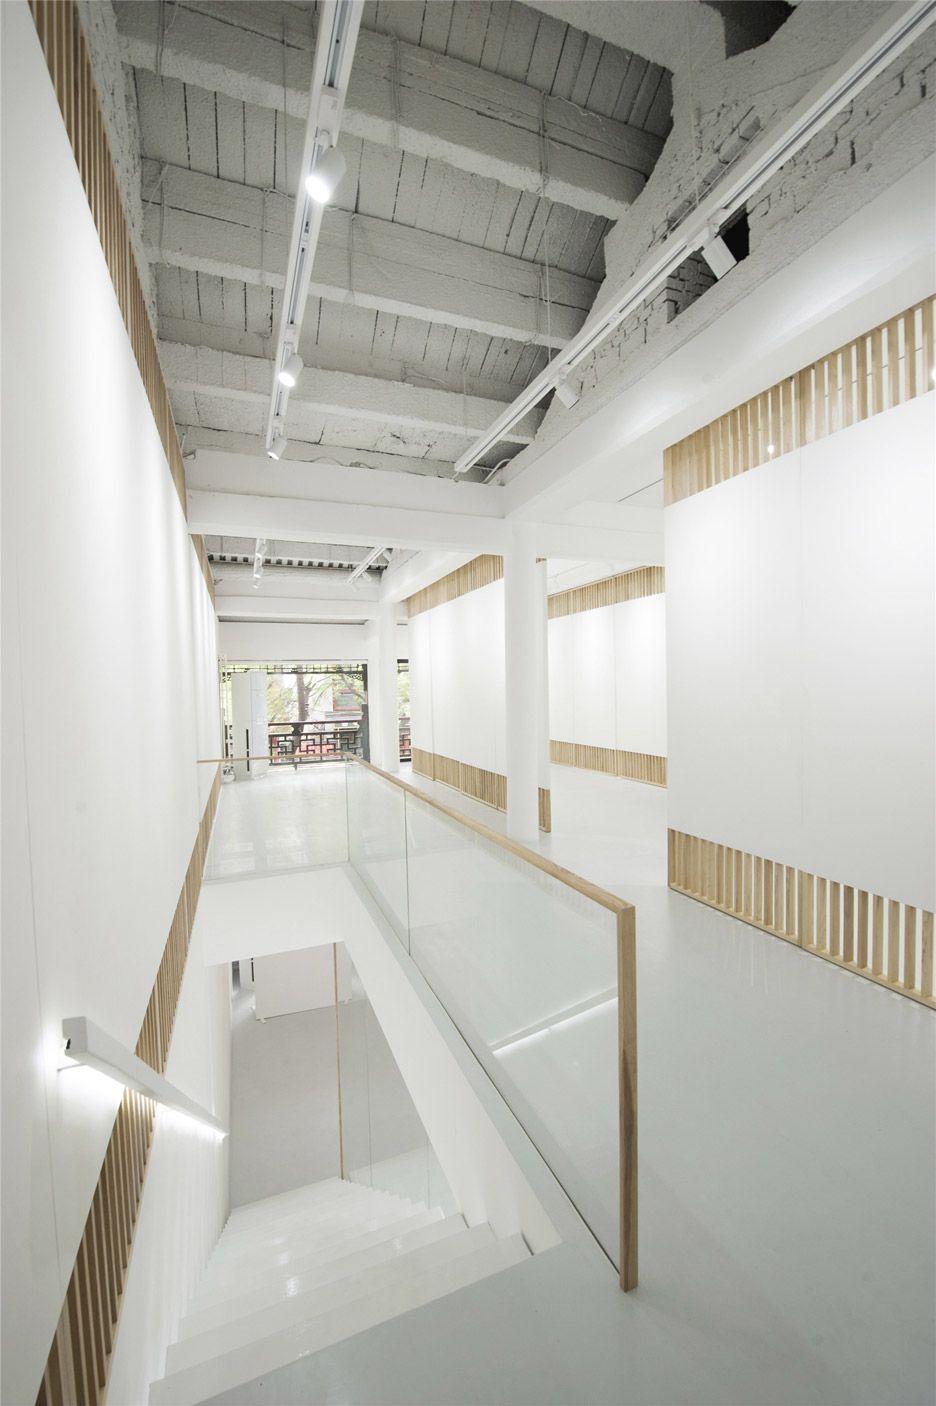 Rongbaozhai Western Art Gallery par Arch studio